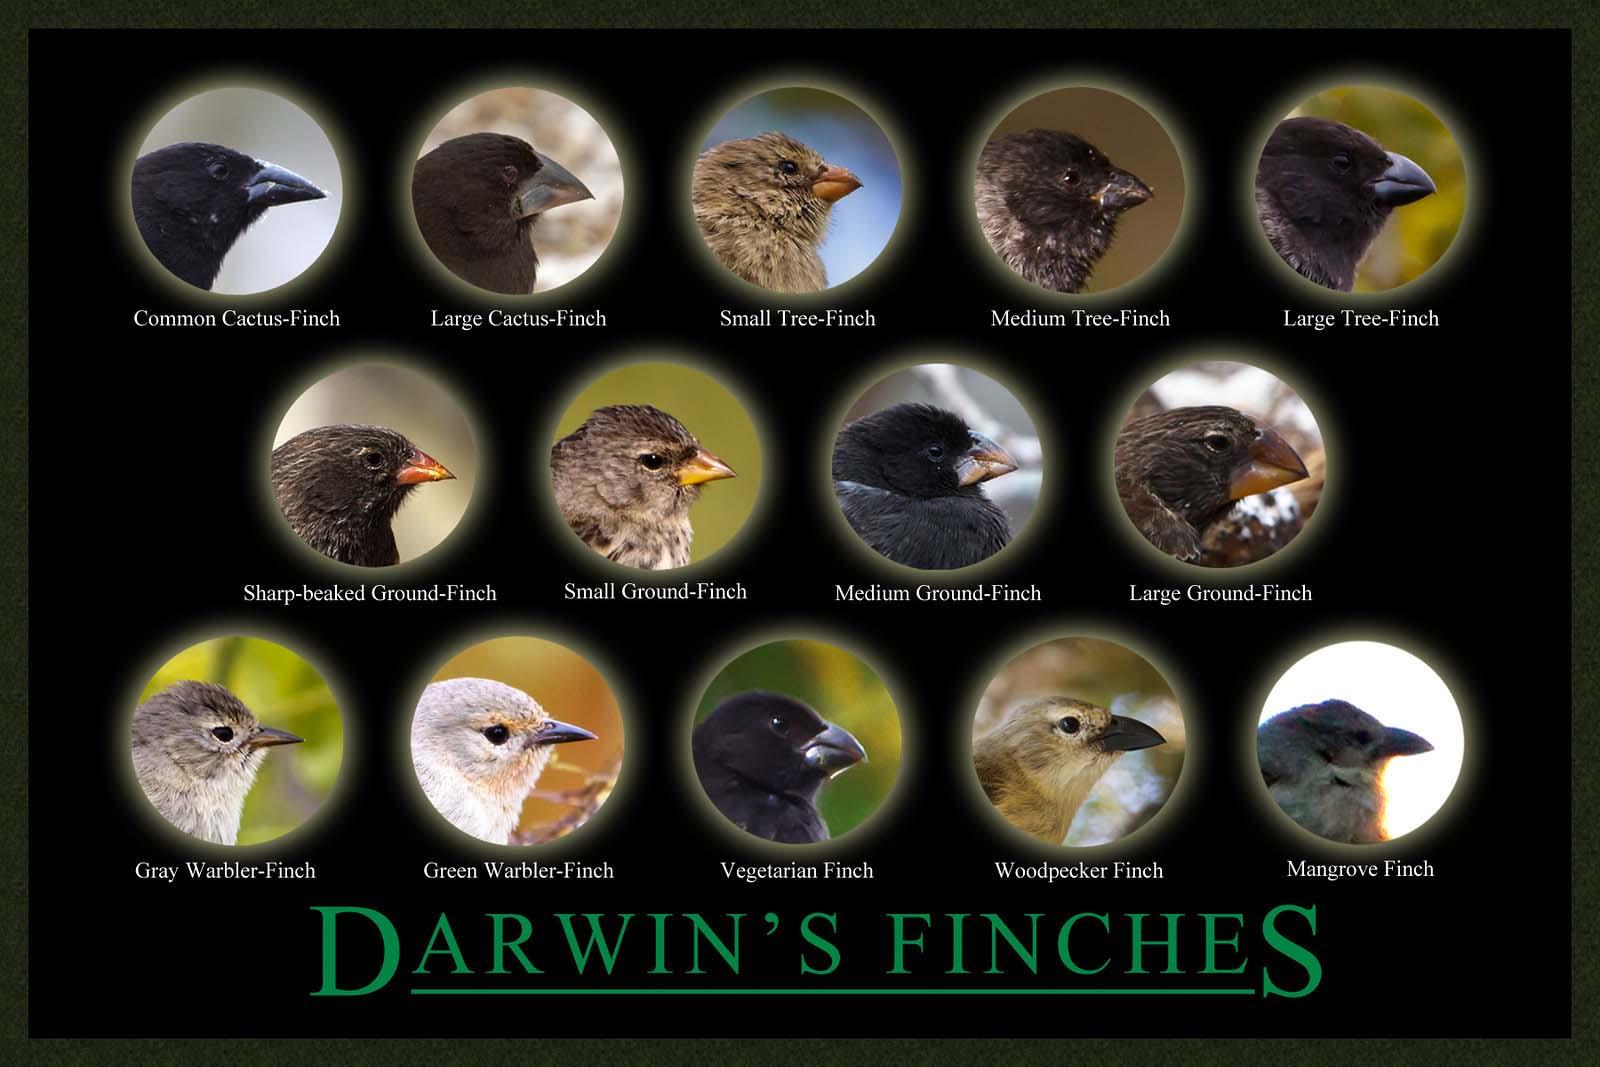 [Image: Darwins-Finches-Galapagos.jpg]